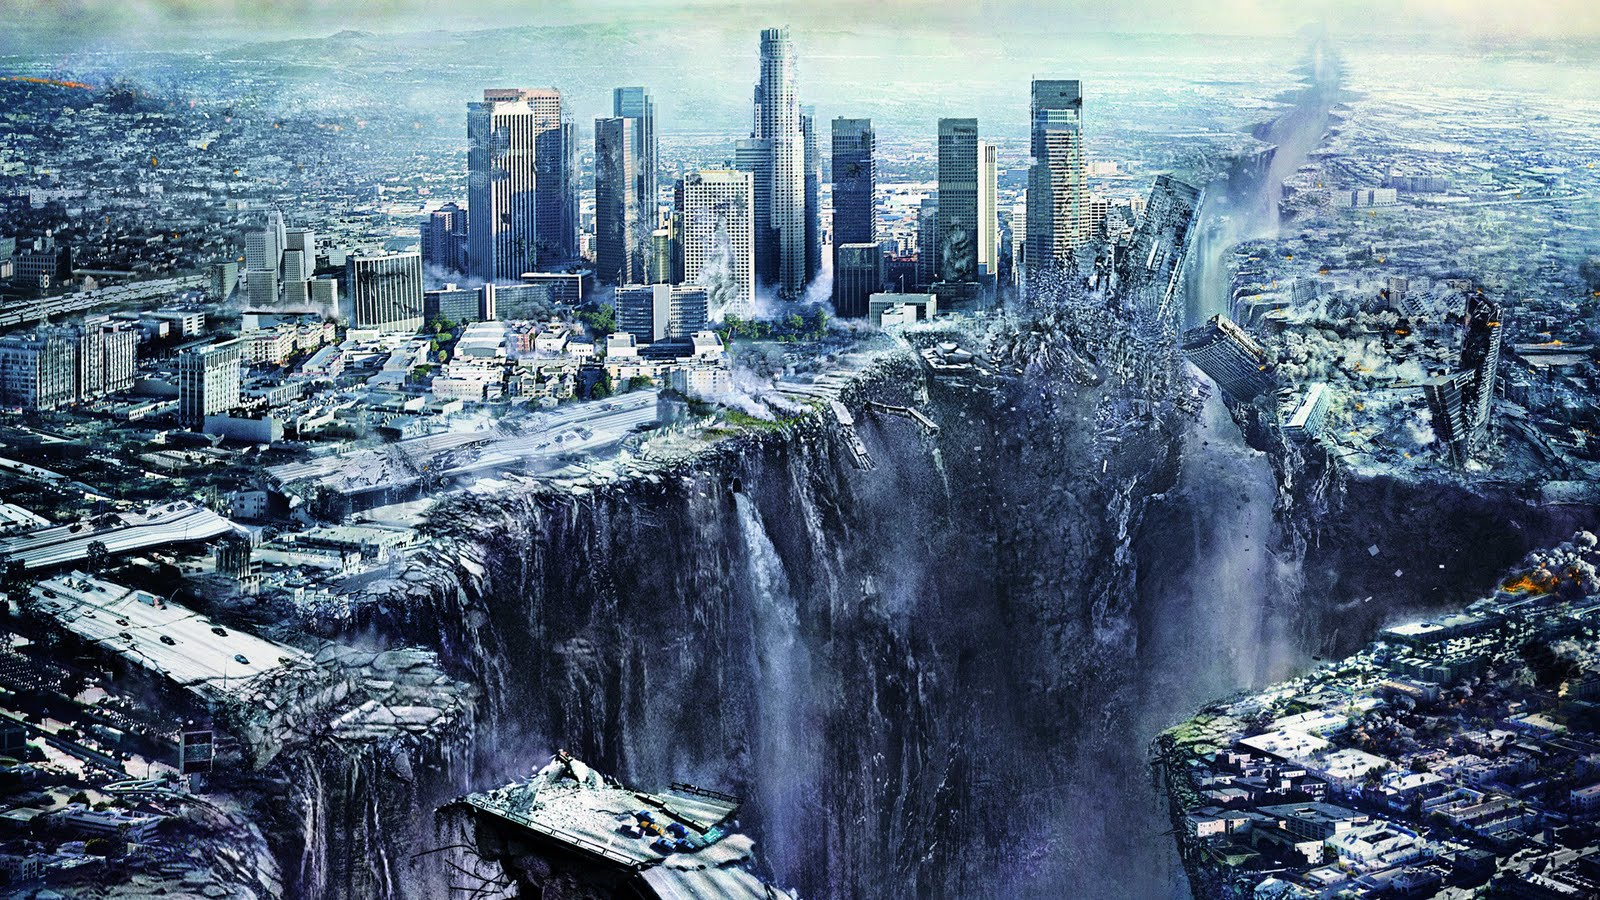 Лос-Анджелес — город на краю бездны